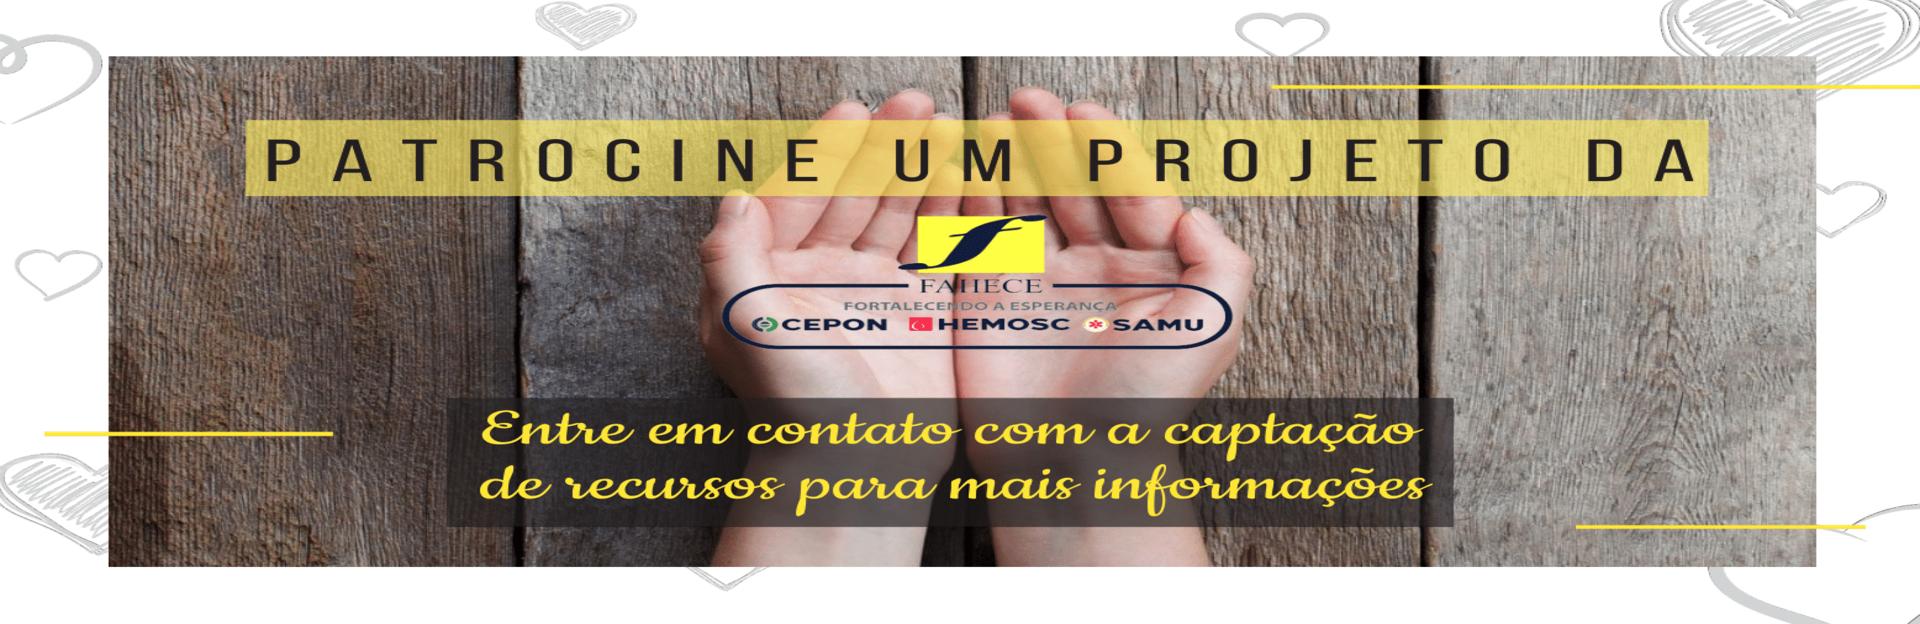 Patrocine um projeto FAHECE, HEMOSC CEPON